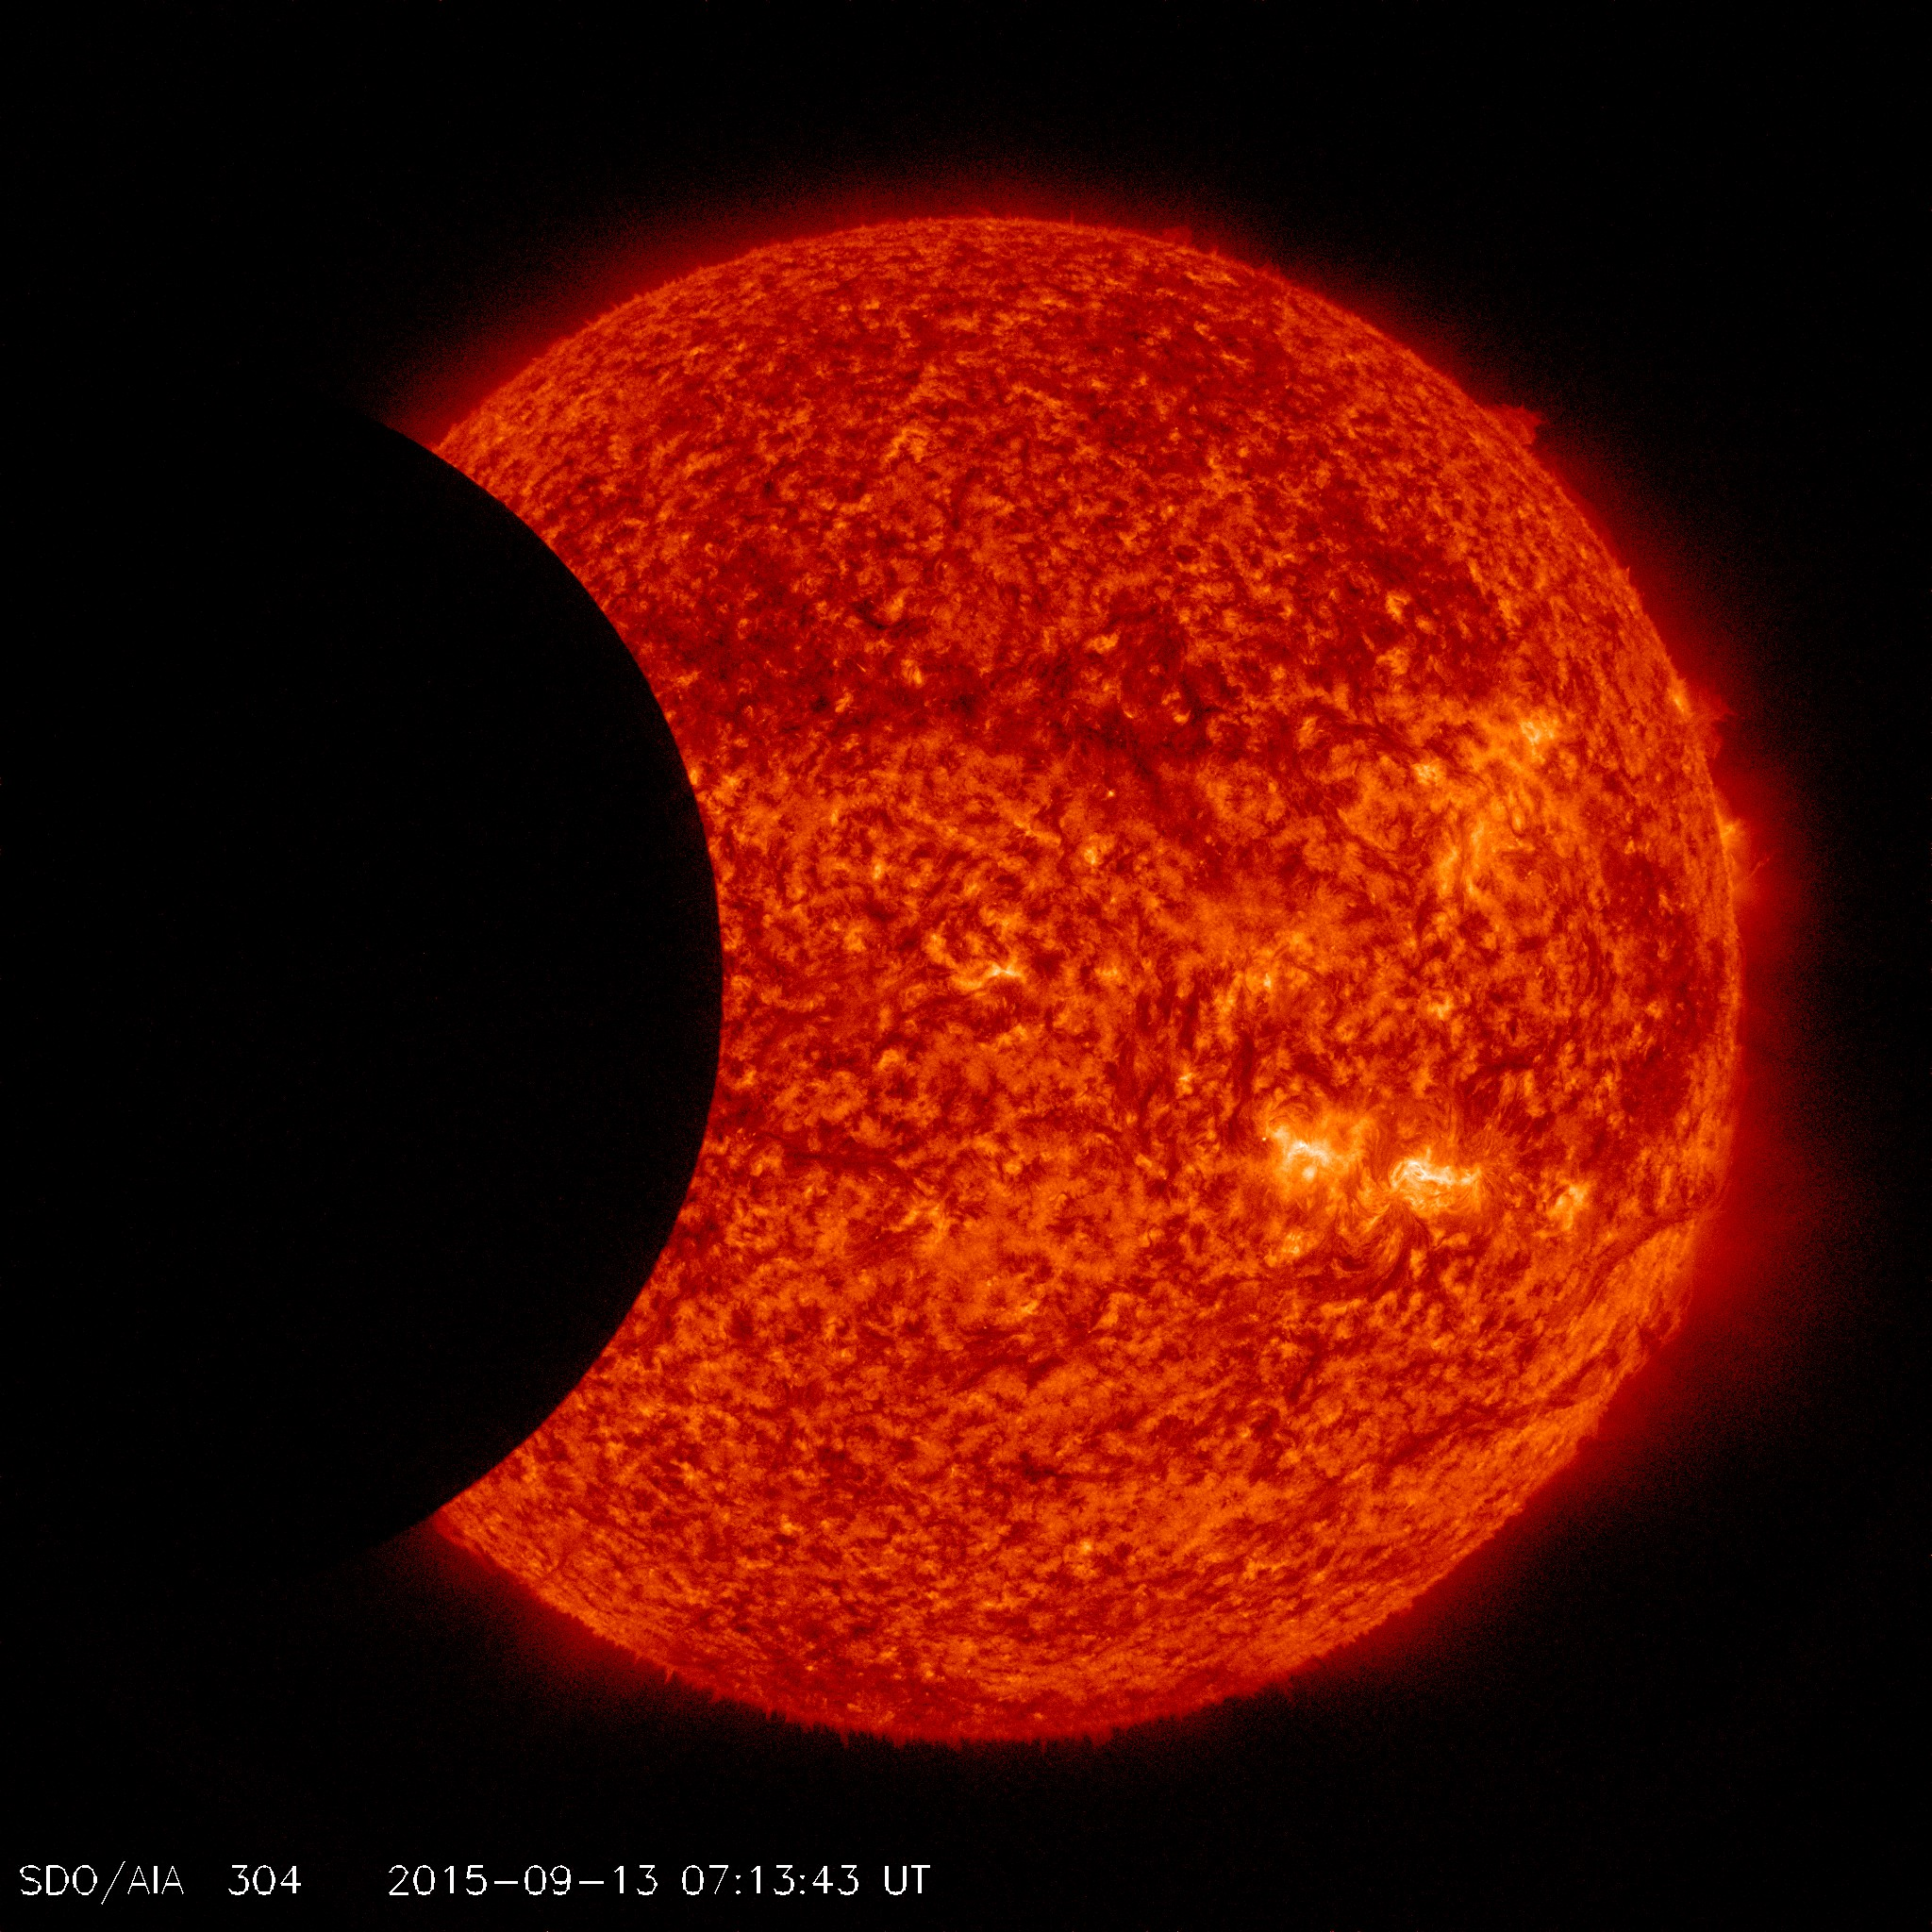 http://spaceweather.com/images2015/13sep15/sdo2.jpg?PHPSESSID=mo2jb4ncl0ccgh4l3fl0j7to41